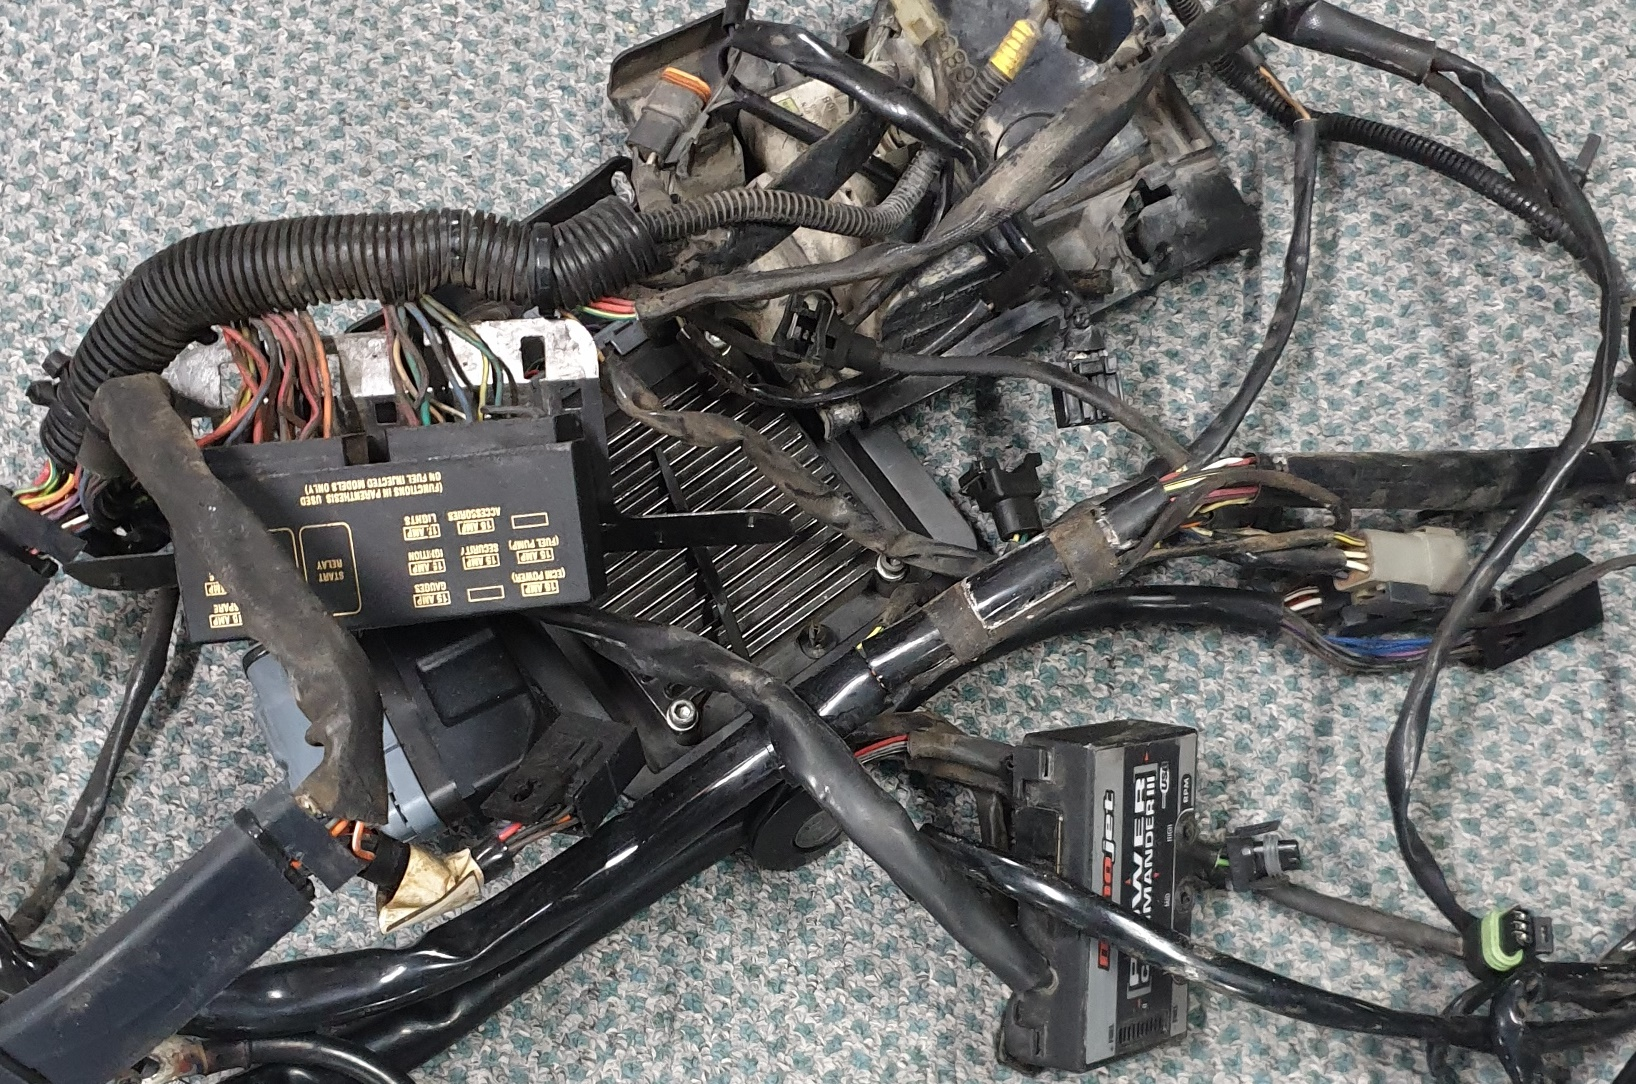 Harley -heritage Softail- Wiring Loom Harness 2003